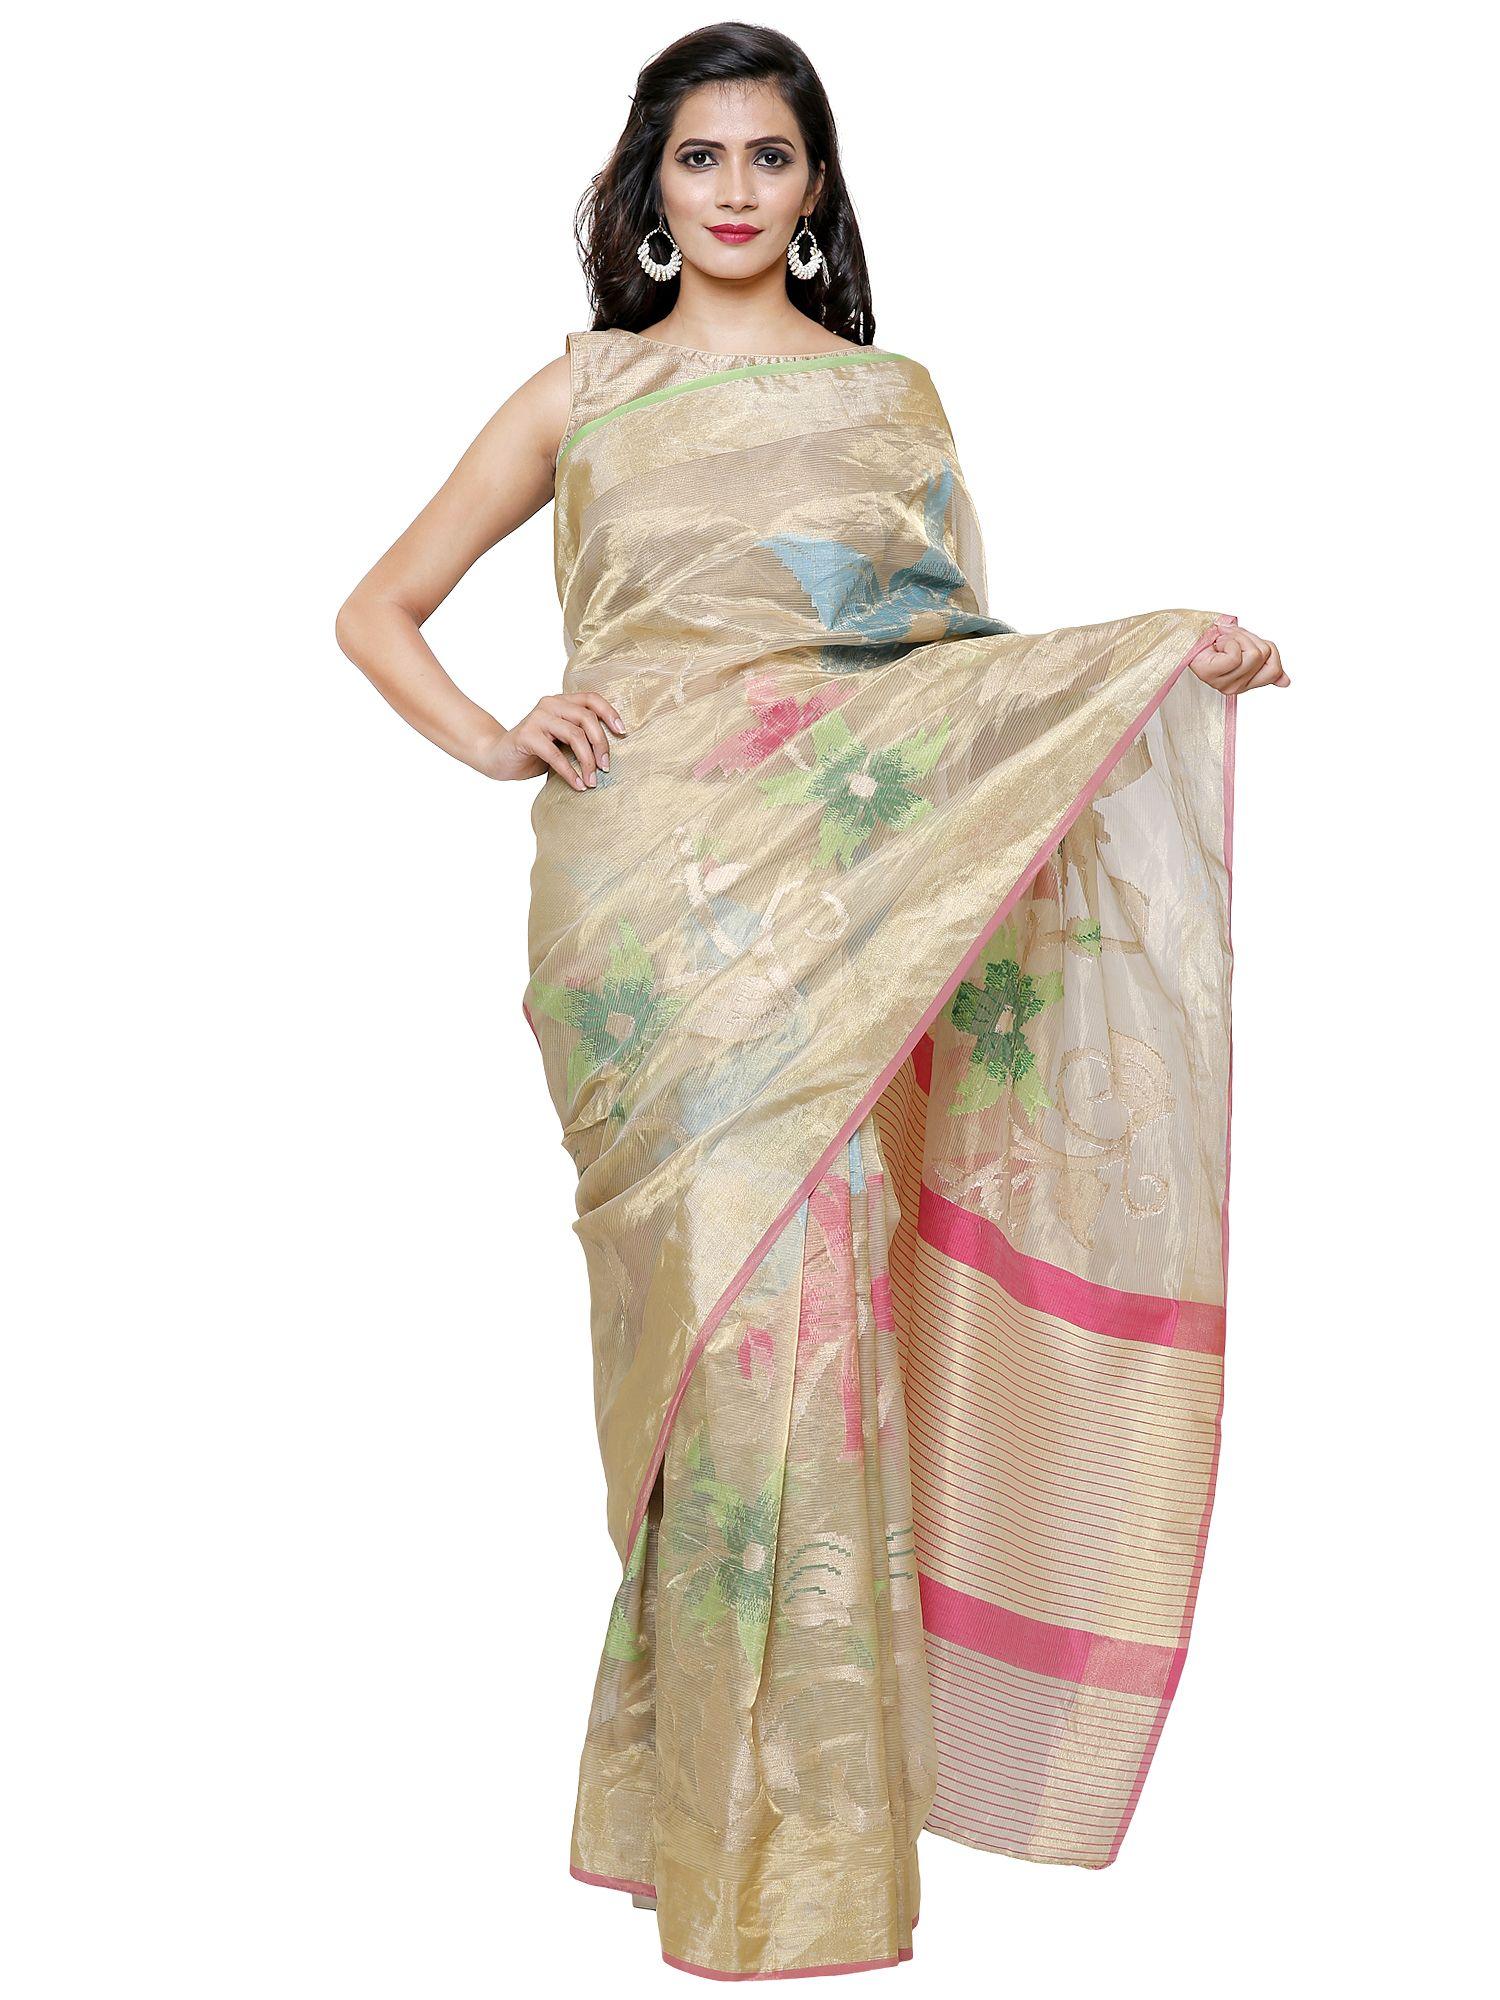 6e88fe3976009 Off White Banarasi Silk Tissue Saree with Multicolor Floral Pattern ...